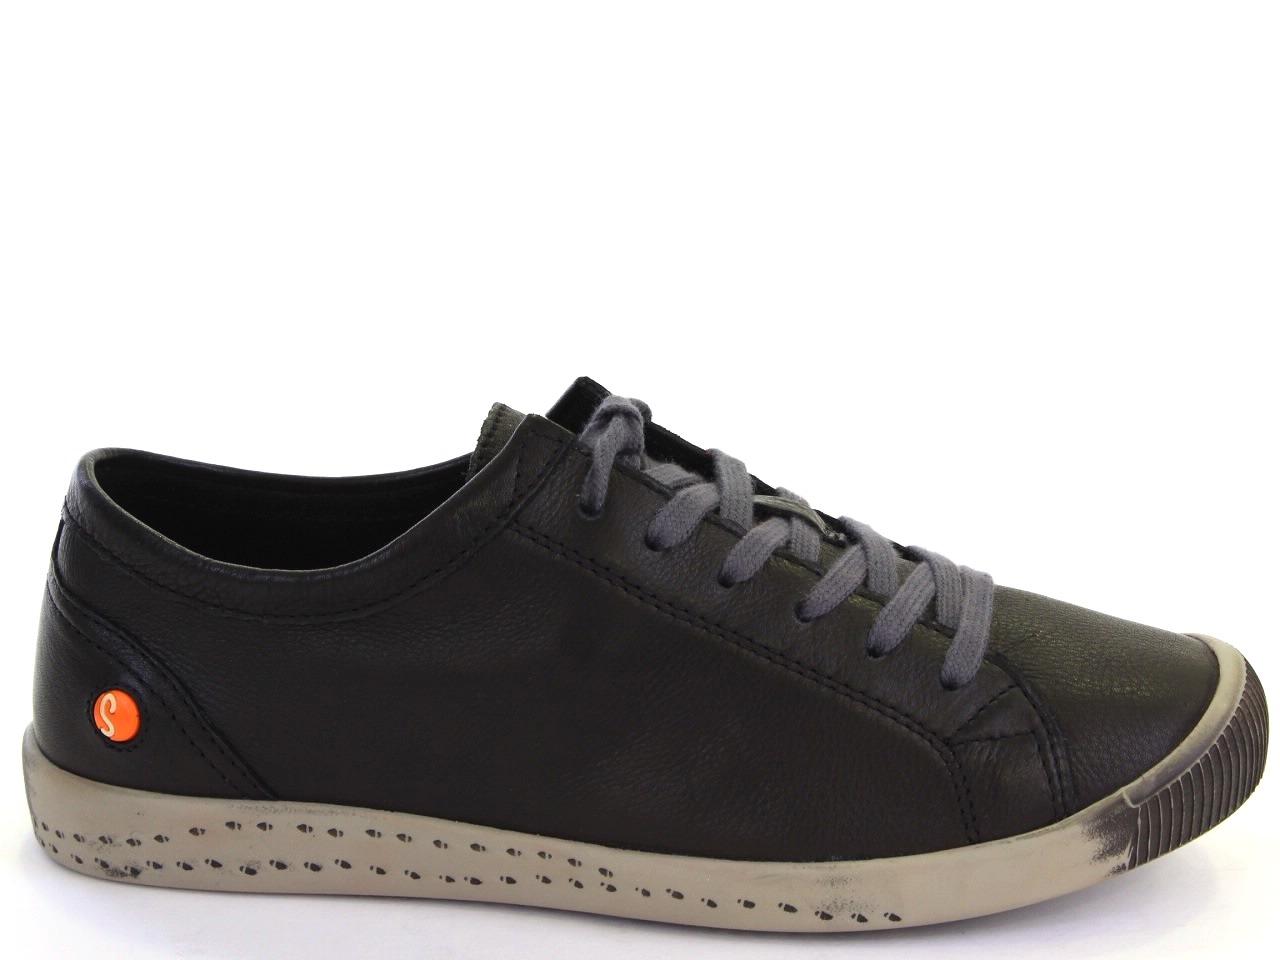 Sneakers, Espadrilles Softinos - 339 ISLA